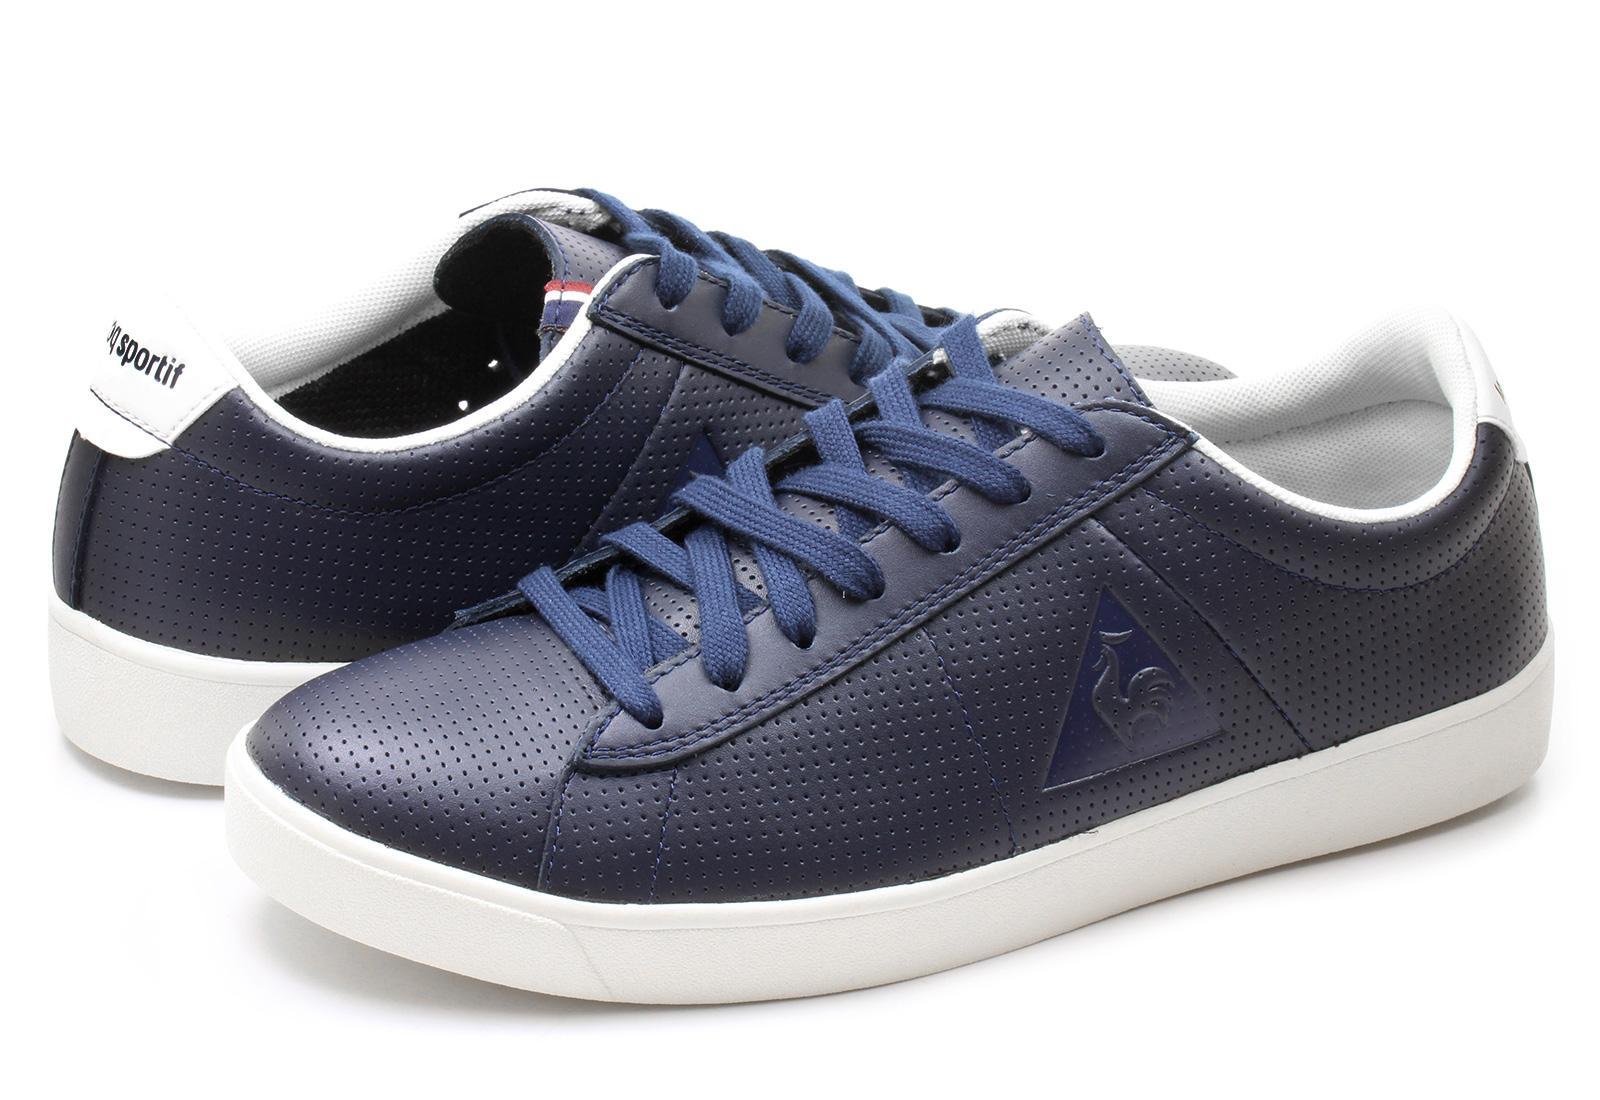 le coq sportif shoes dax punched 1511197 online shop. Black Bedroom Furniture Sets. Home Design Ideas